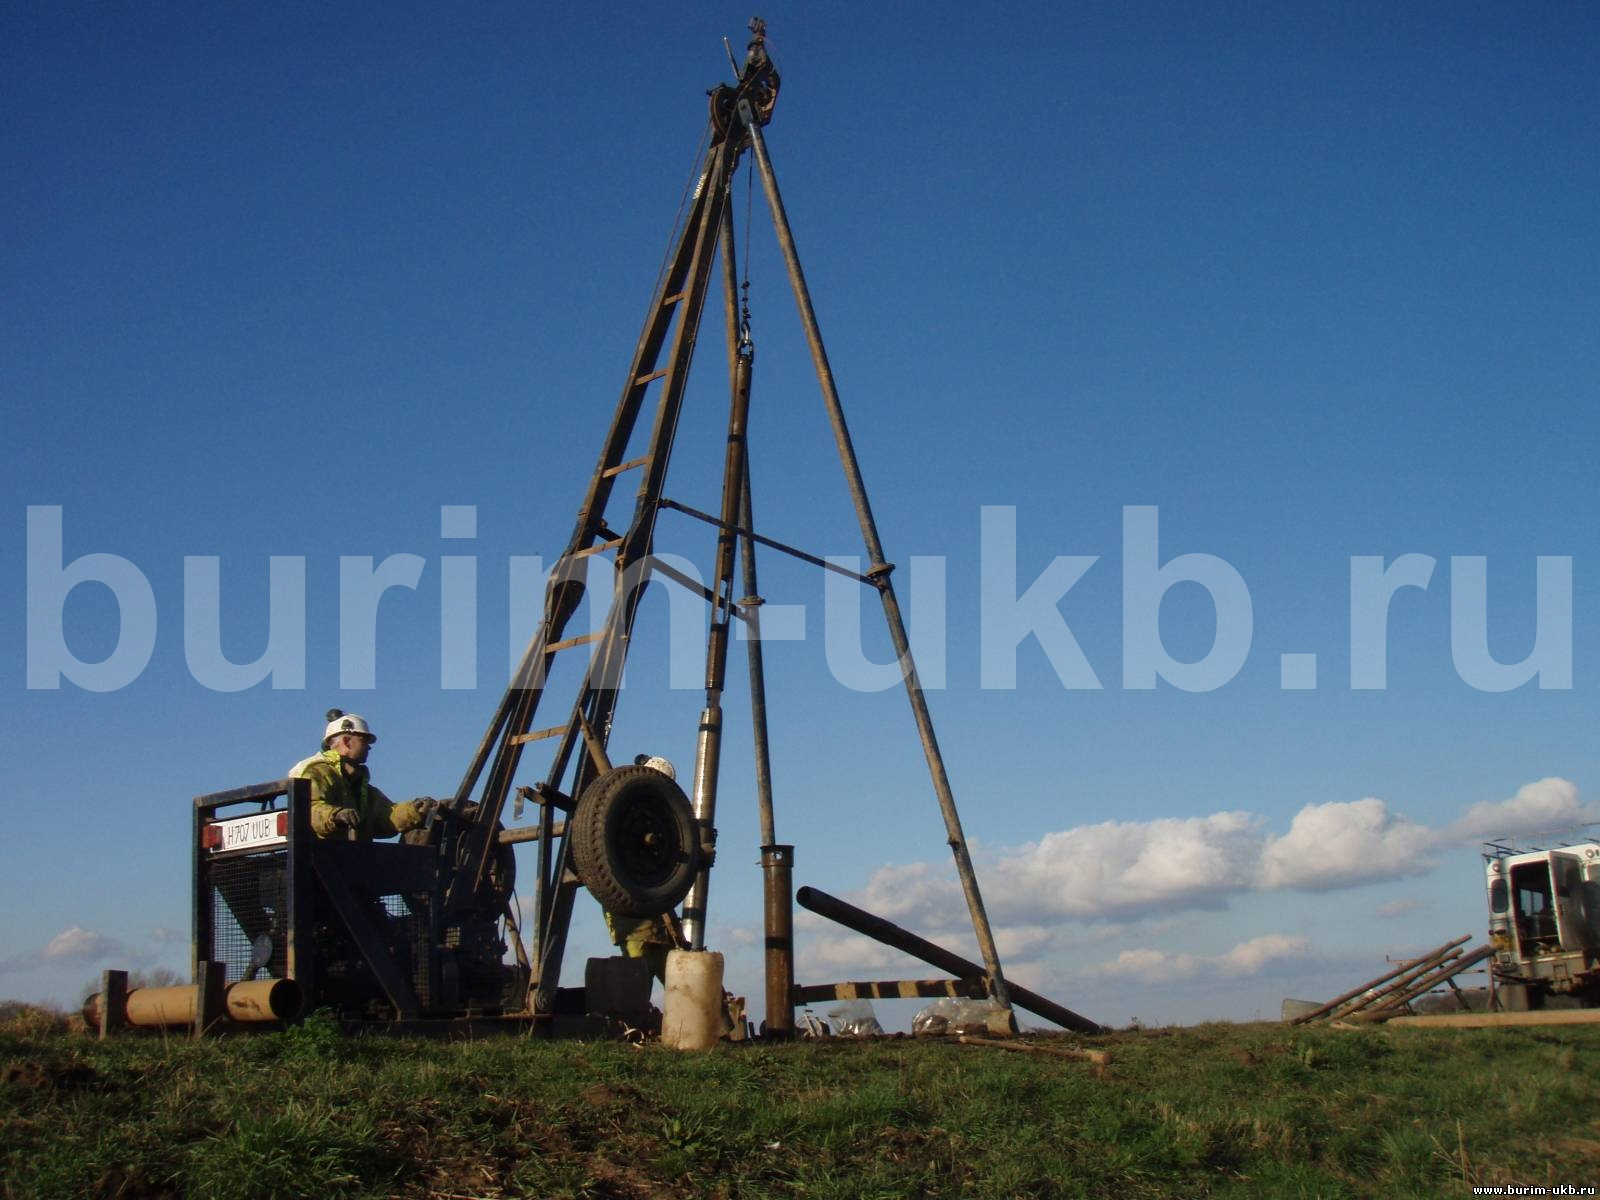 Burovaya-ustanovka_BURIM-UKB.RU 088.jpg